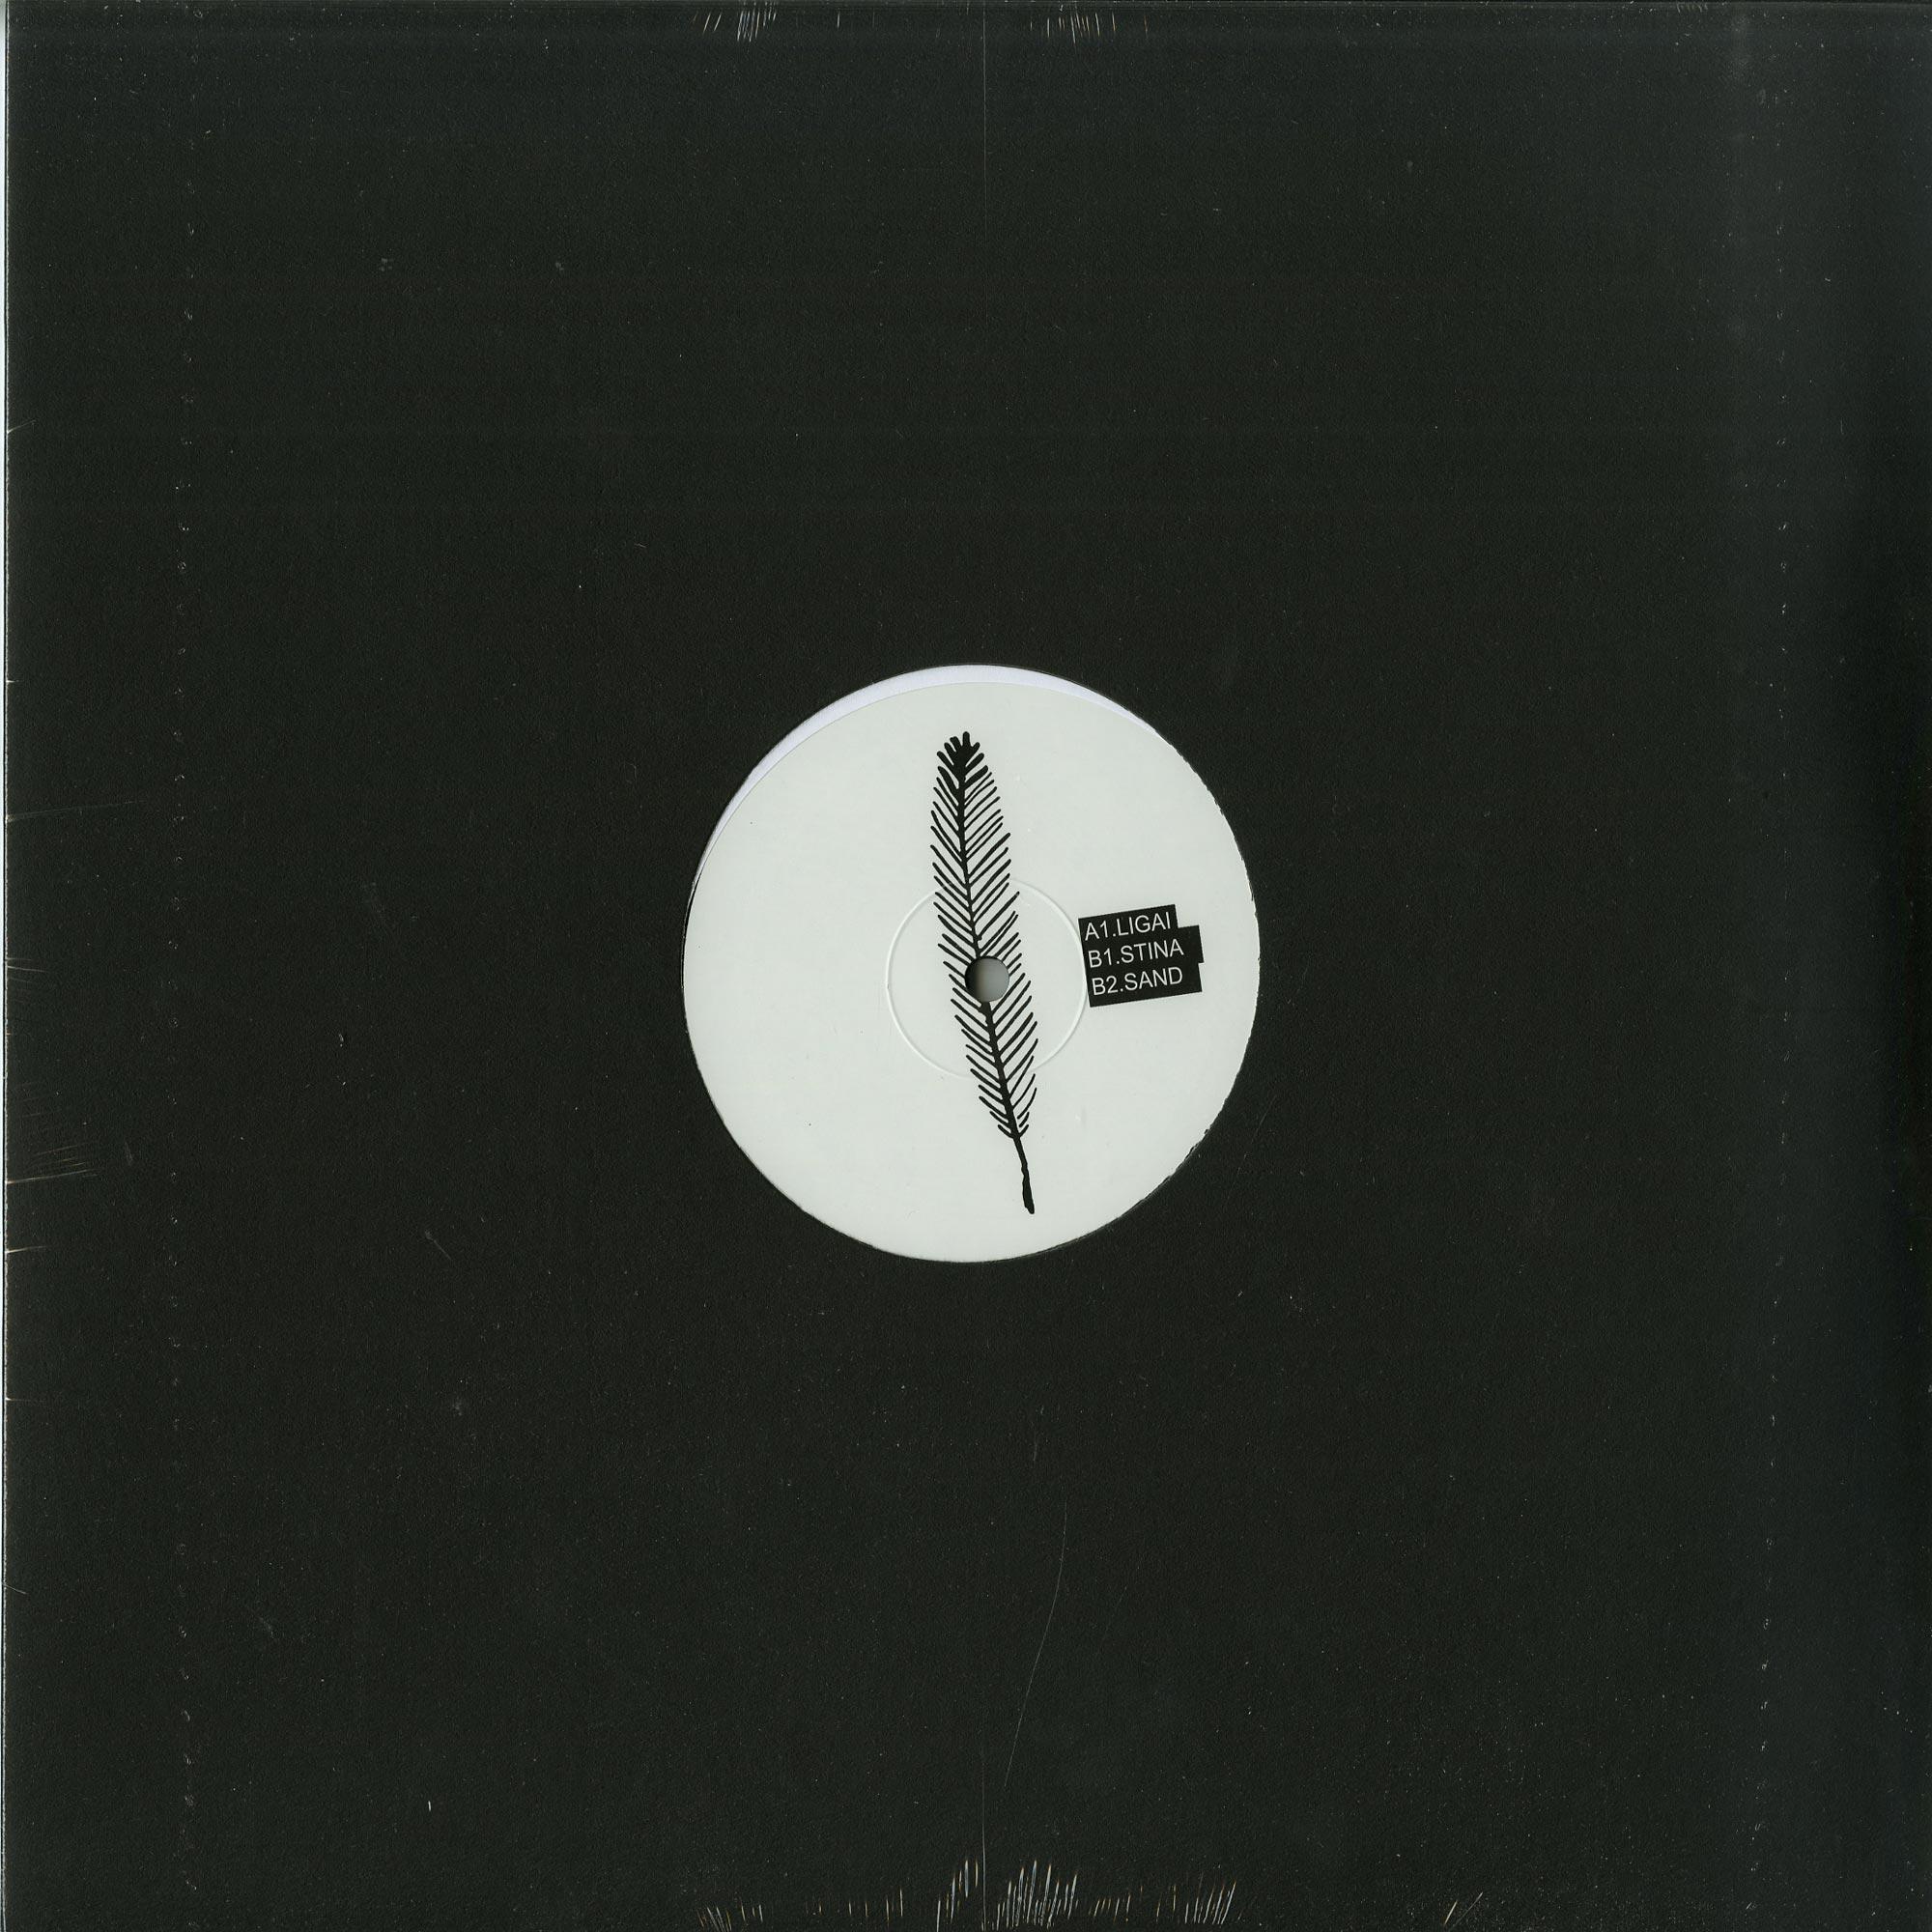 Unknown - LIGAI EP